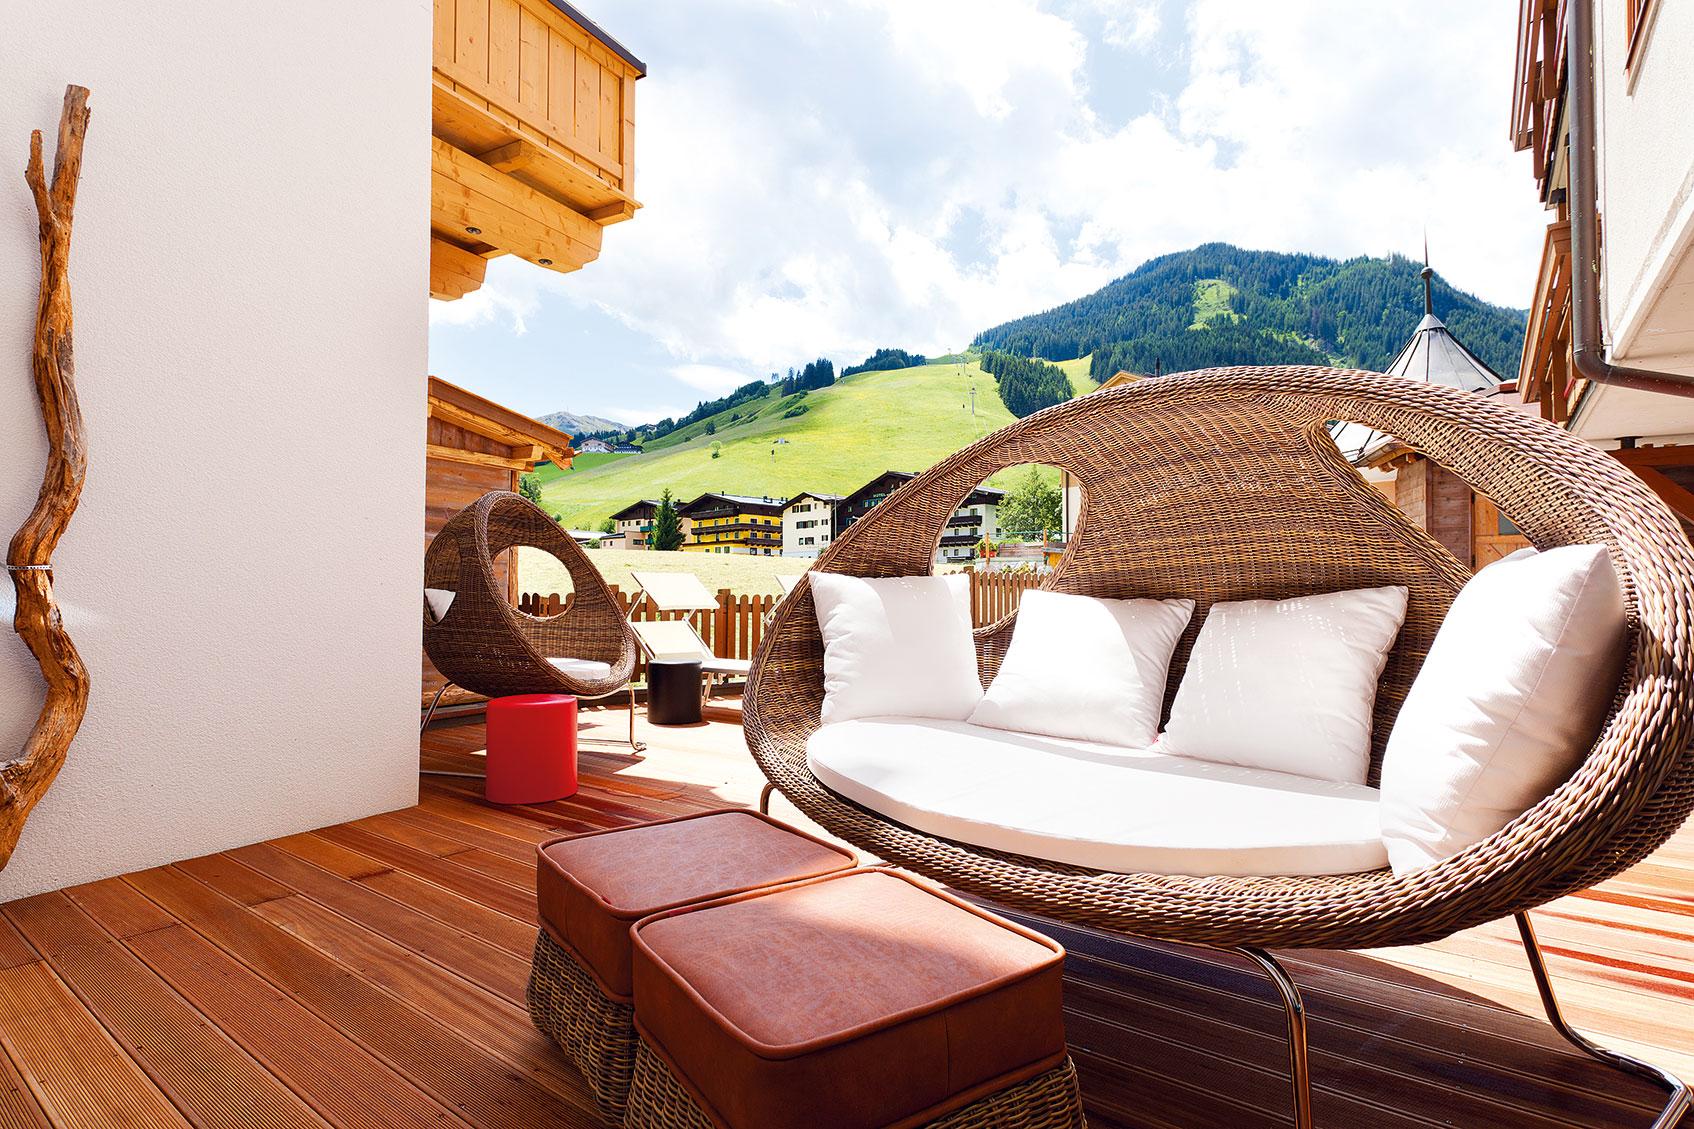 Terrasse mit Sofakorb